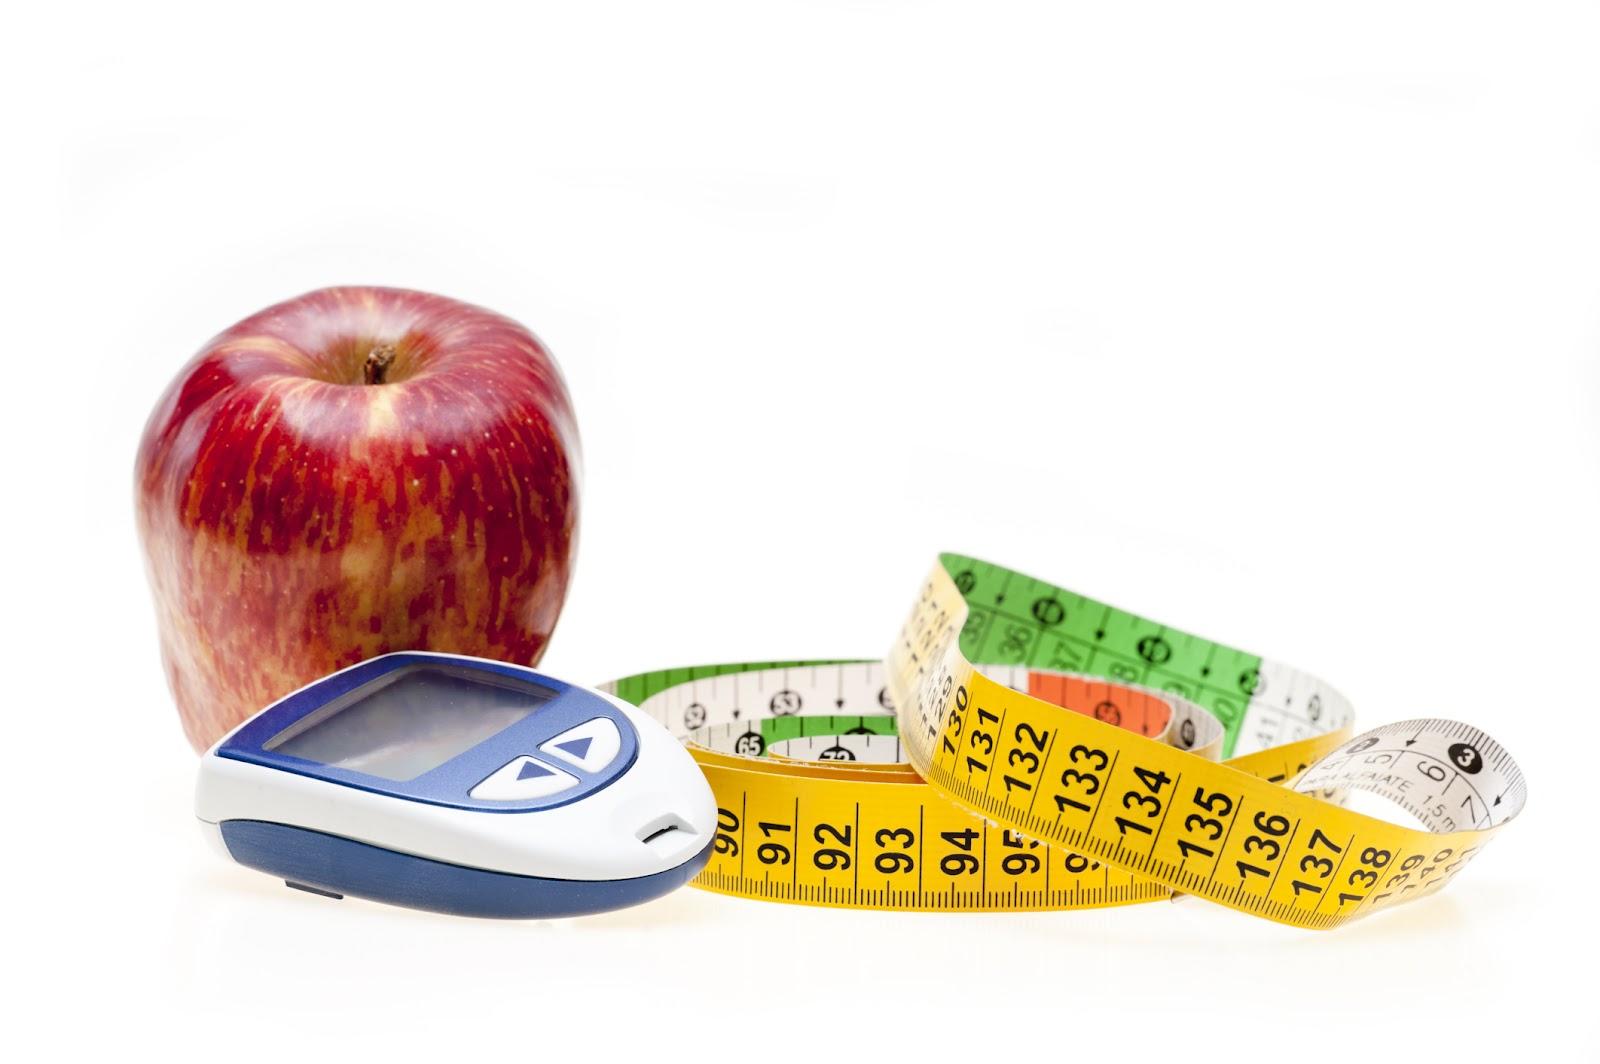 Diabetes Melitus Penyebab Kematian Nomor 6 di Dunia: Kemenkes Tawarkan Solusi CERDIK Melalui Posbindu